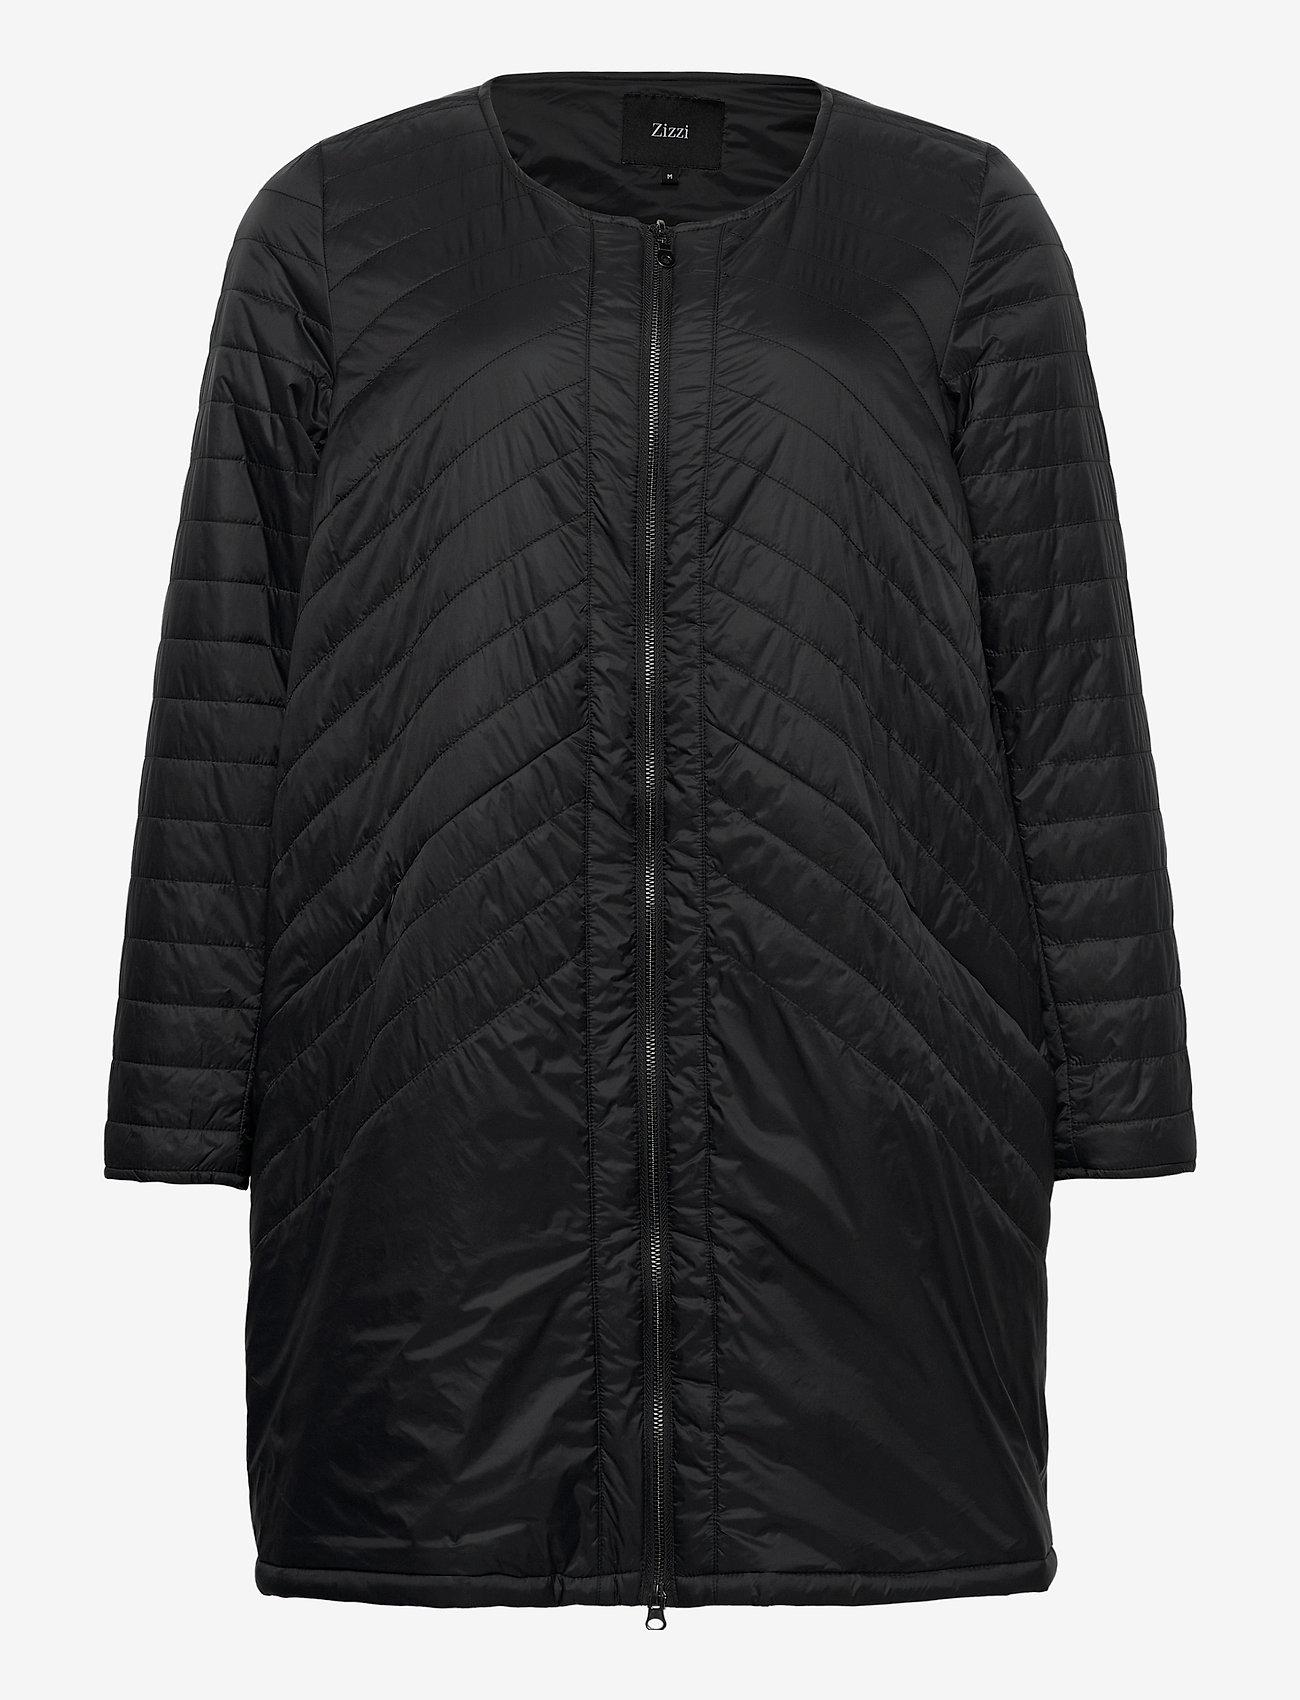 Jacket Quilted Plus Size Zip Round Neck (Black) (63.99 €) - Zizzi sHAYp